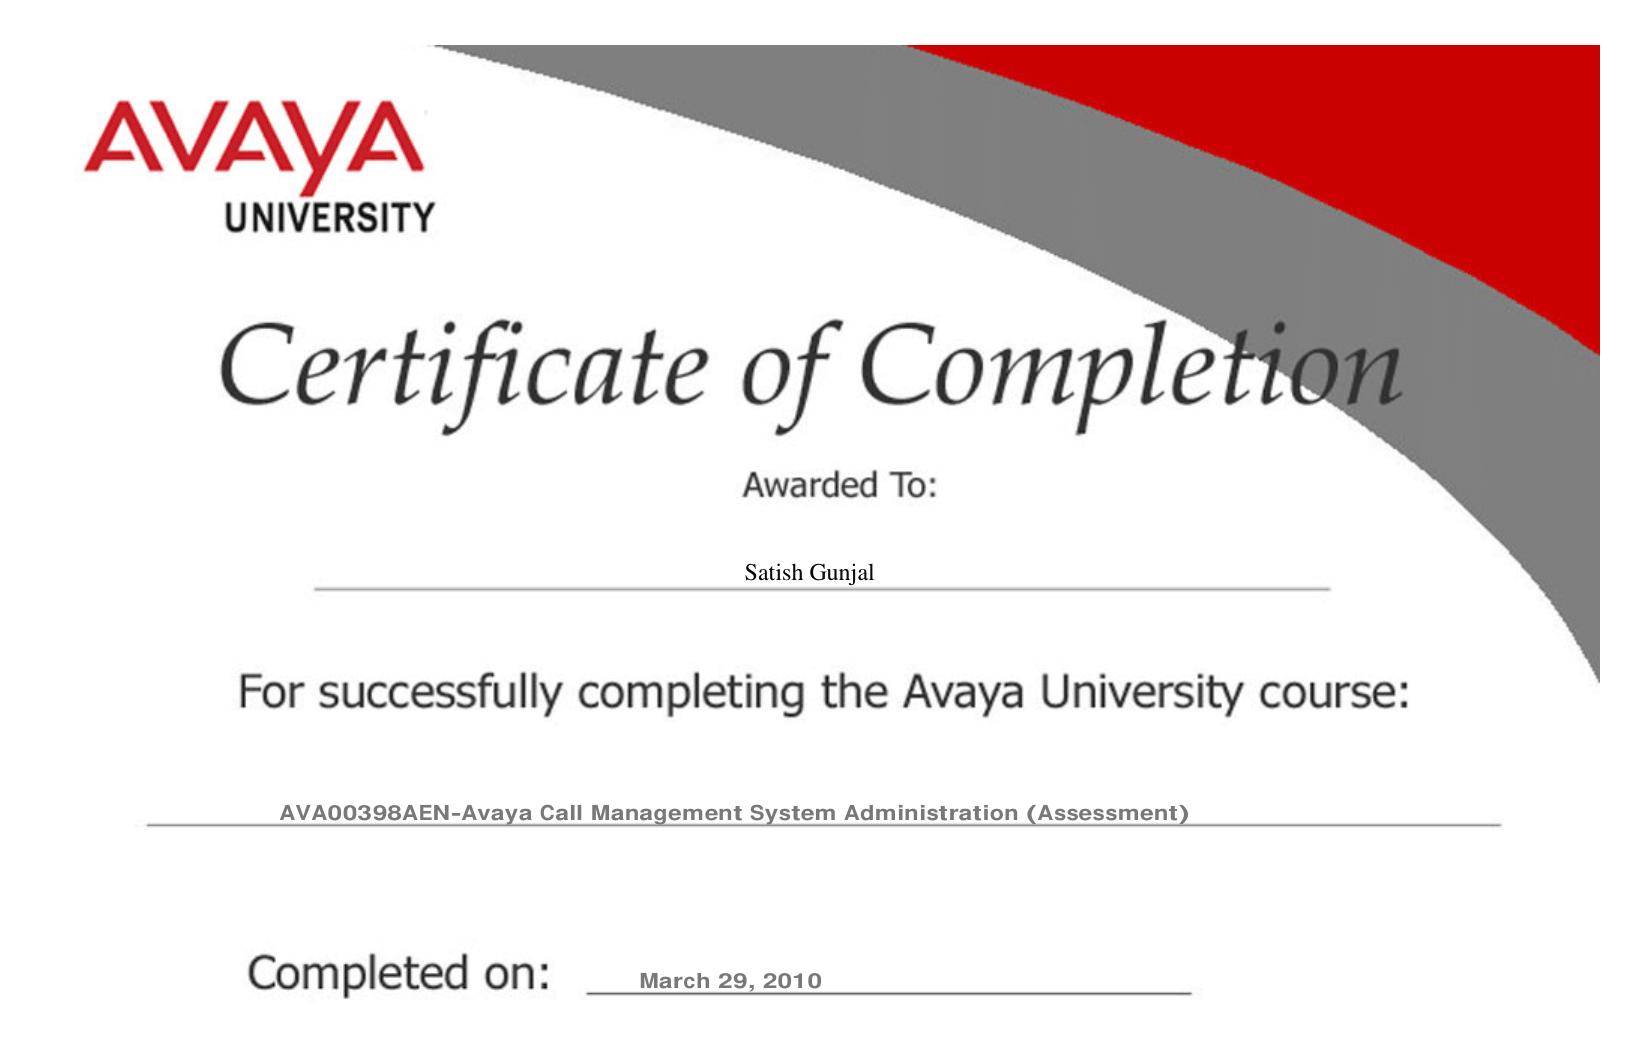 Avaya Call Management System Administration Assessment